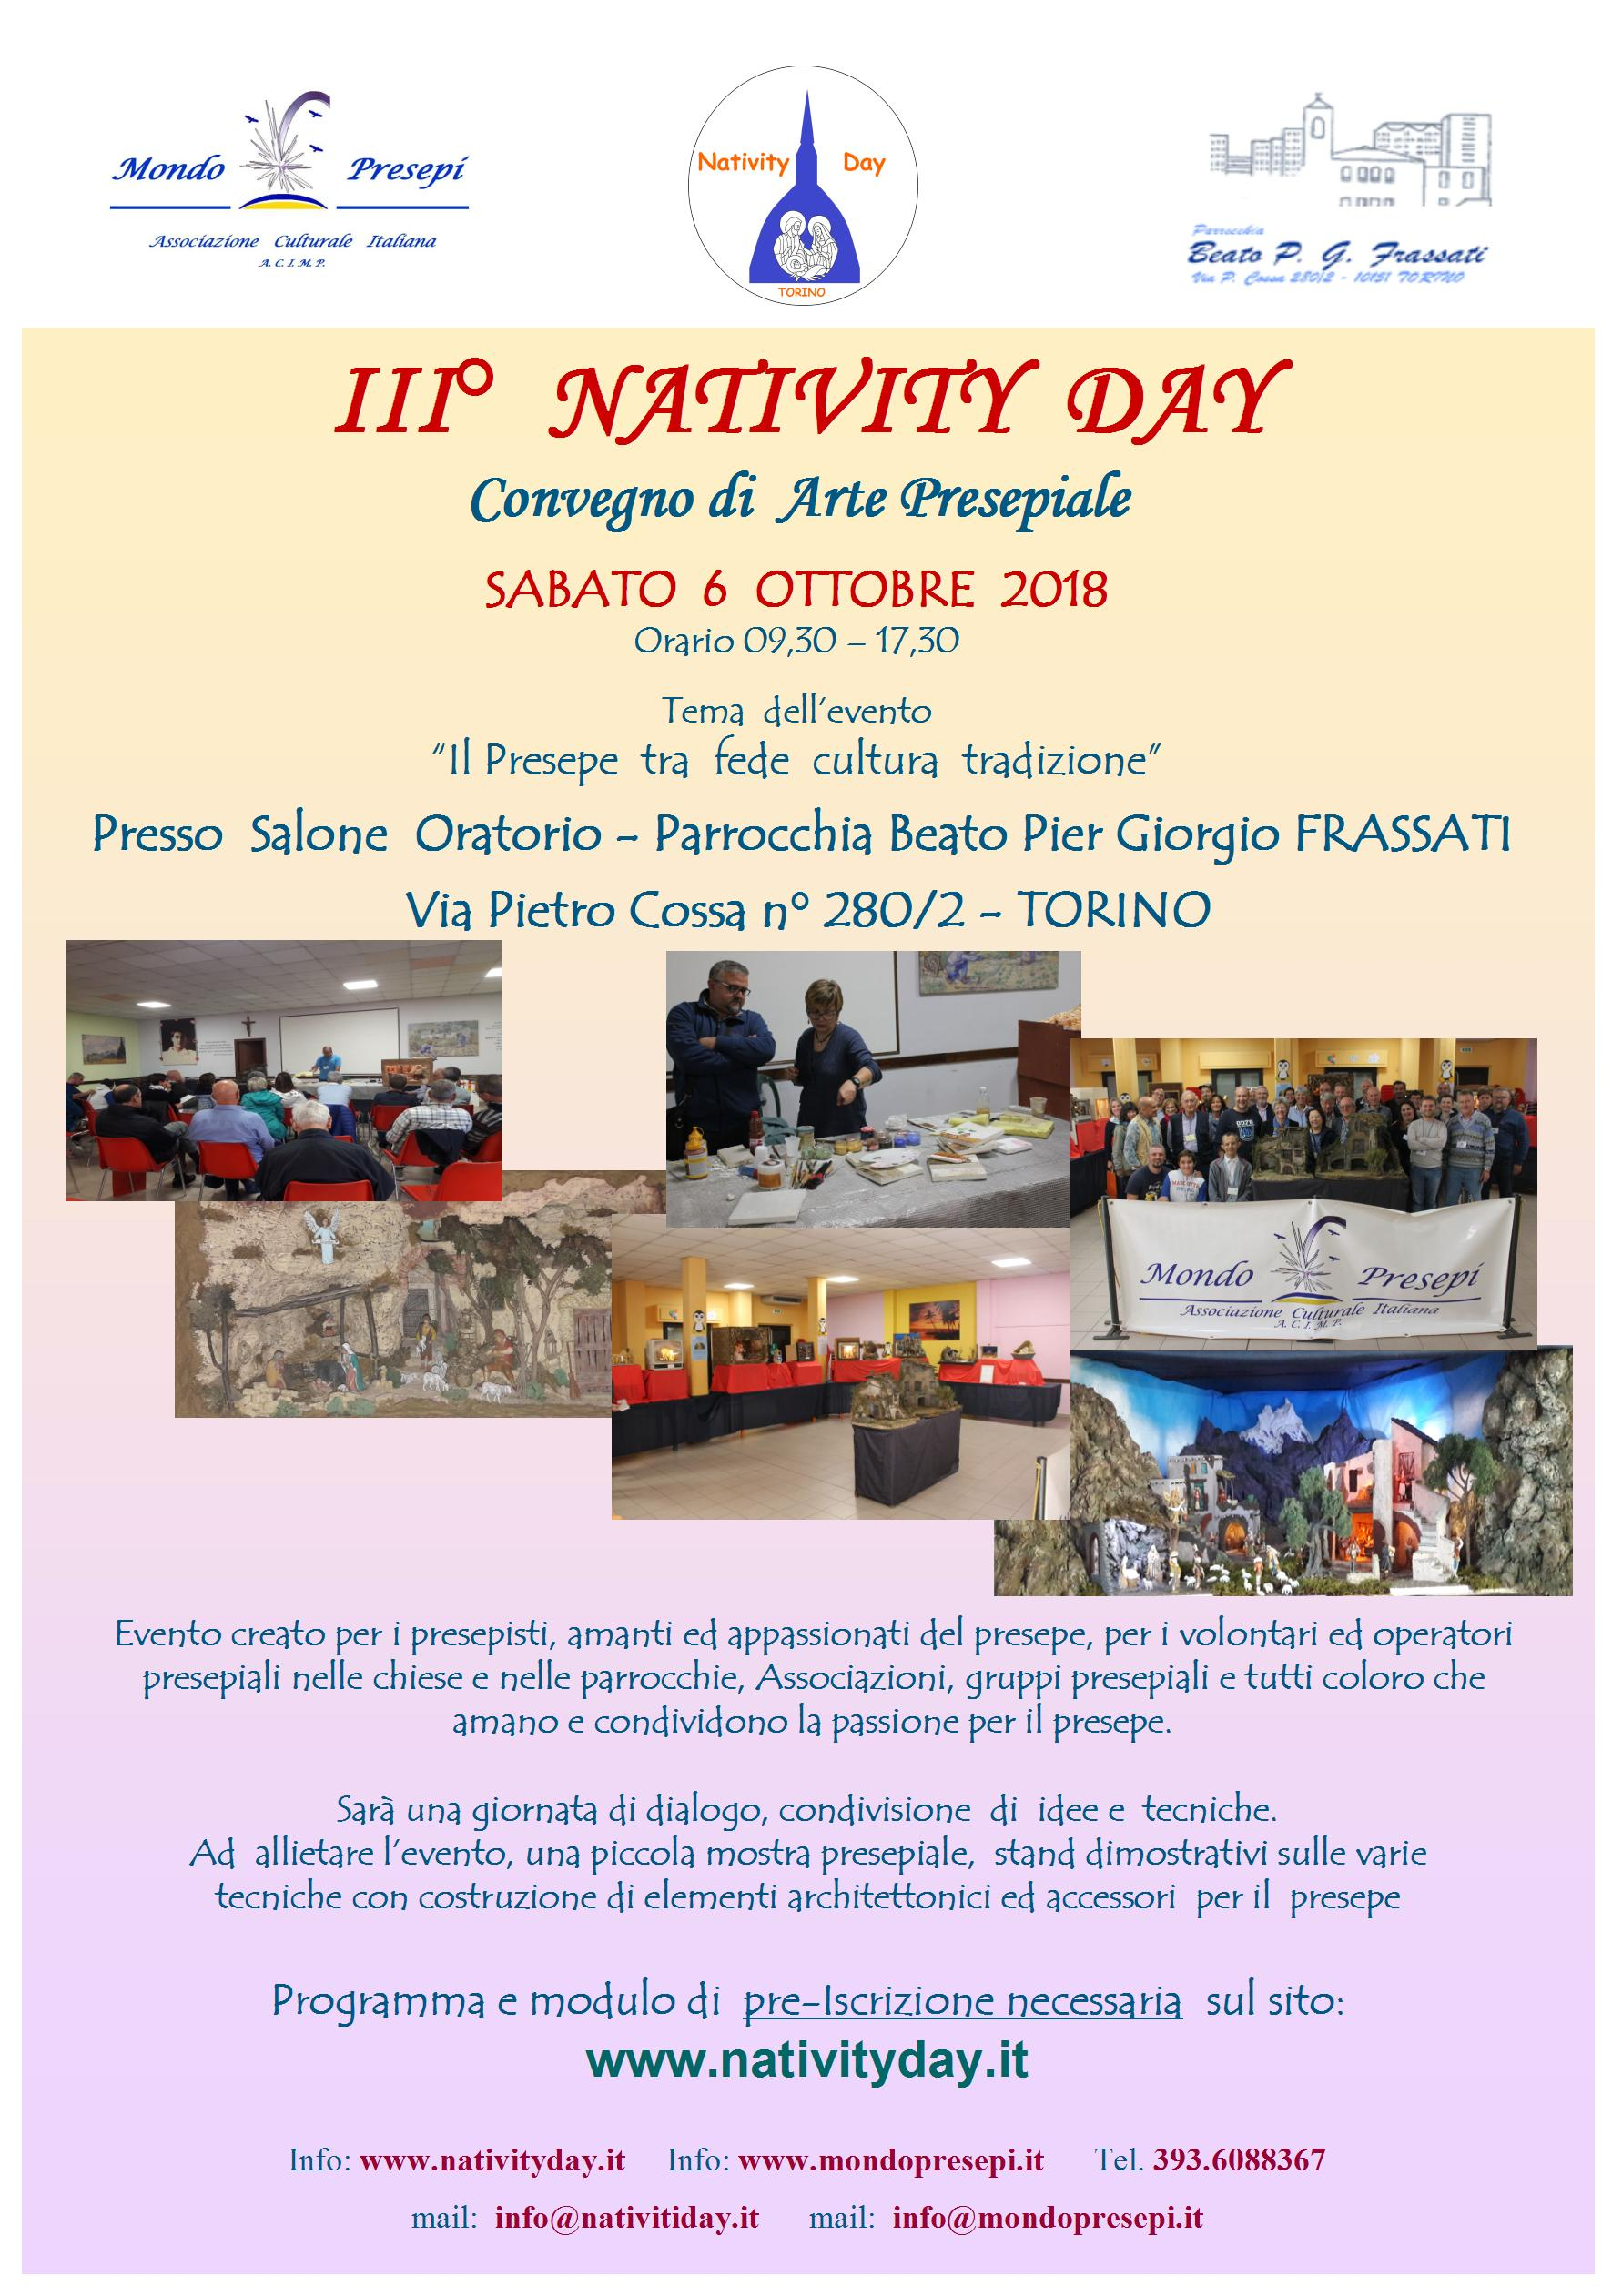 NativityDay 6 Ottobre 2018 - Torino - Iscriviti  !!